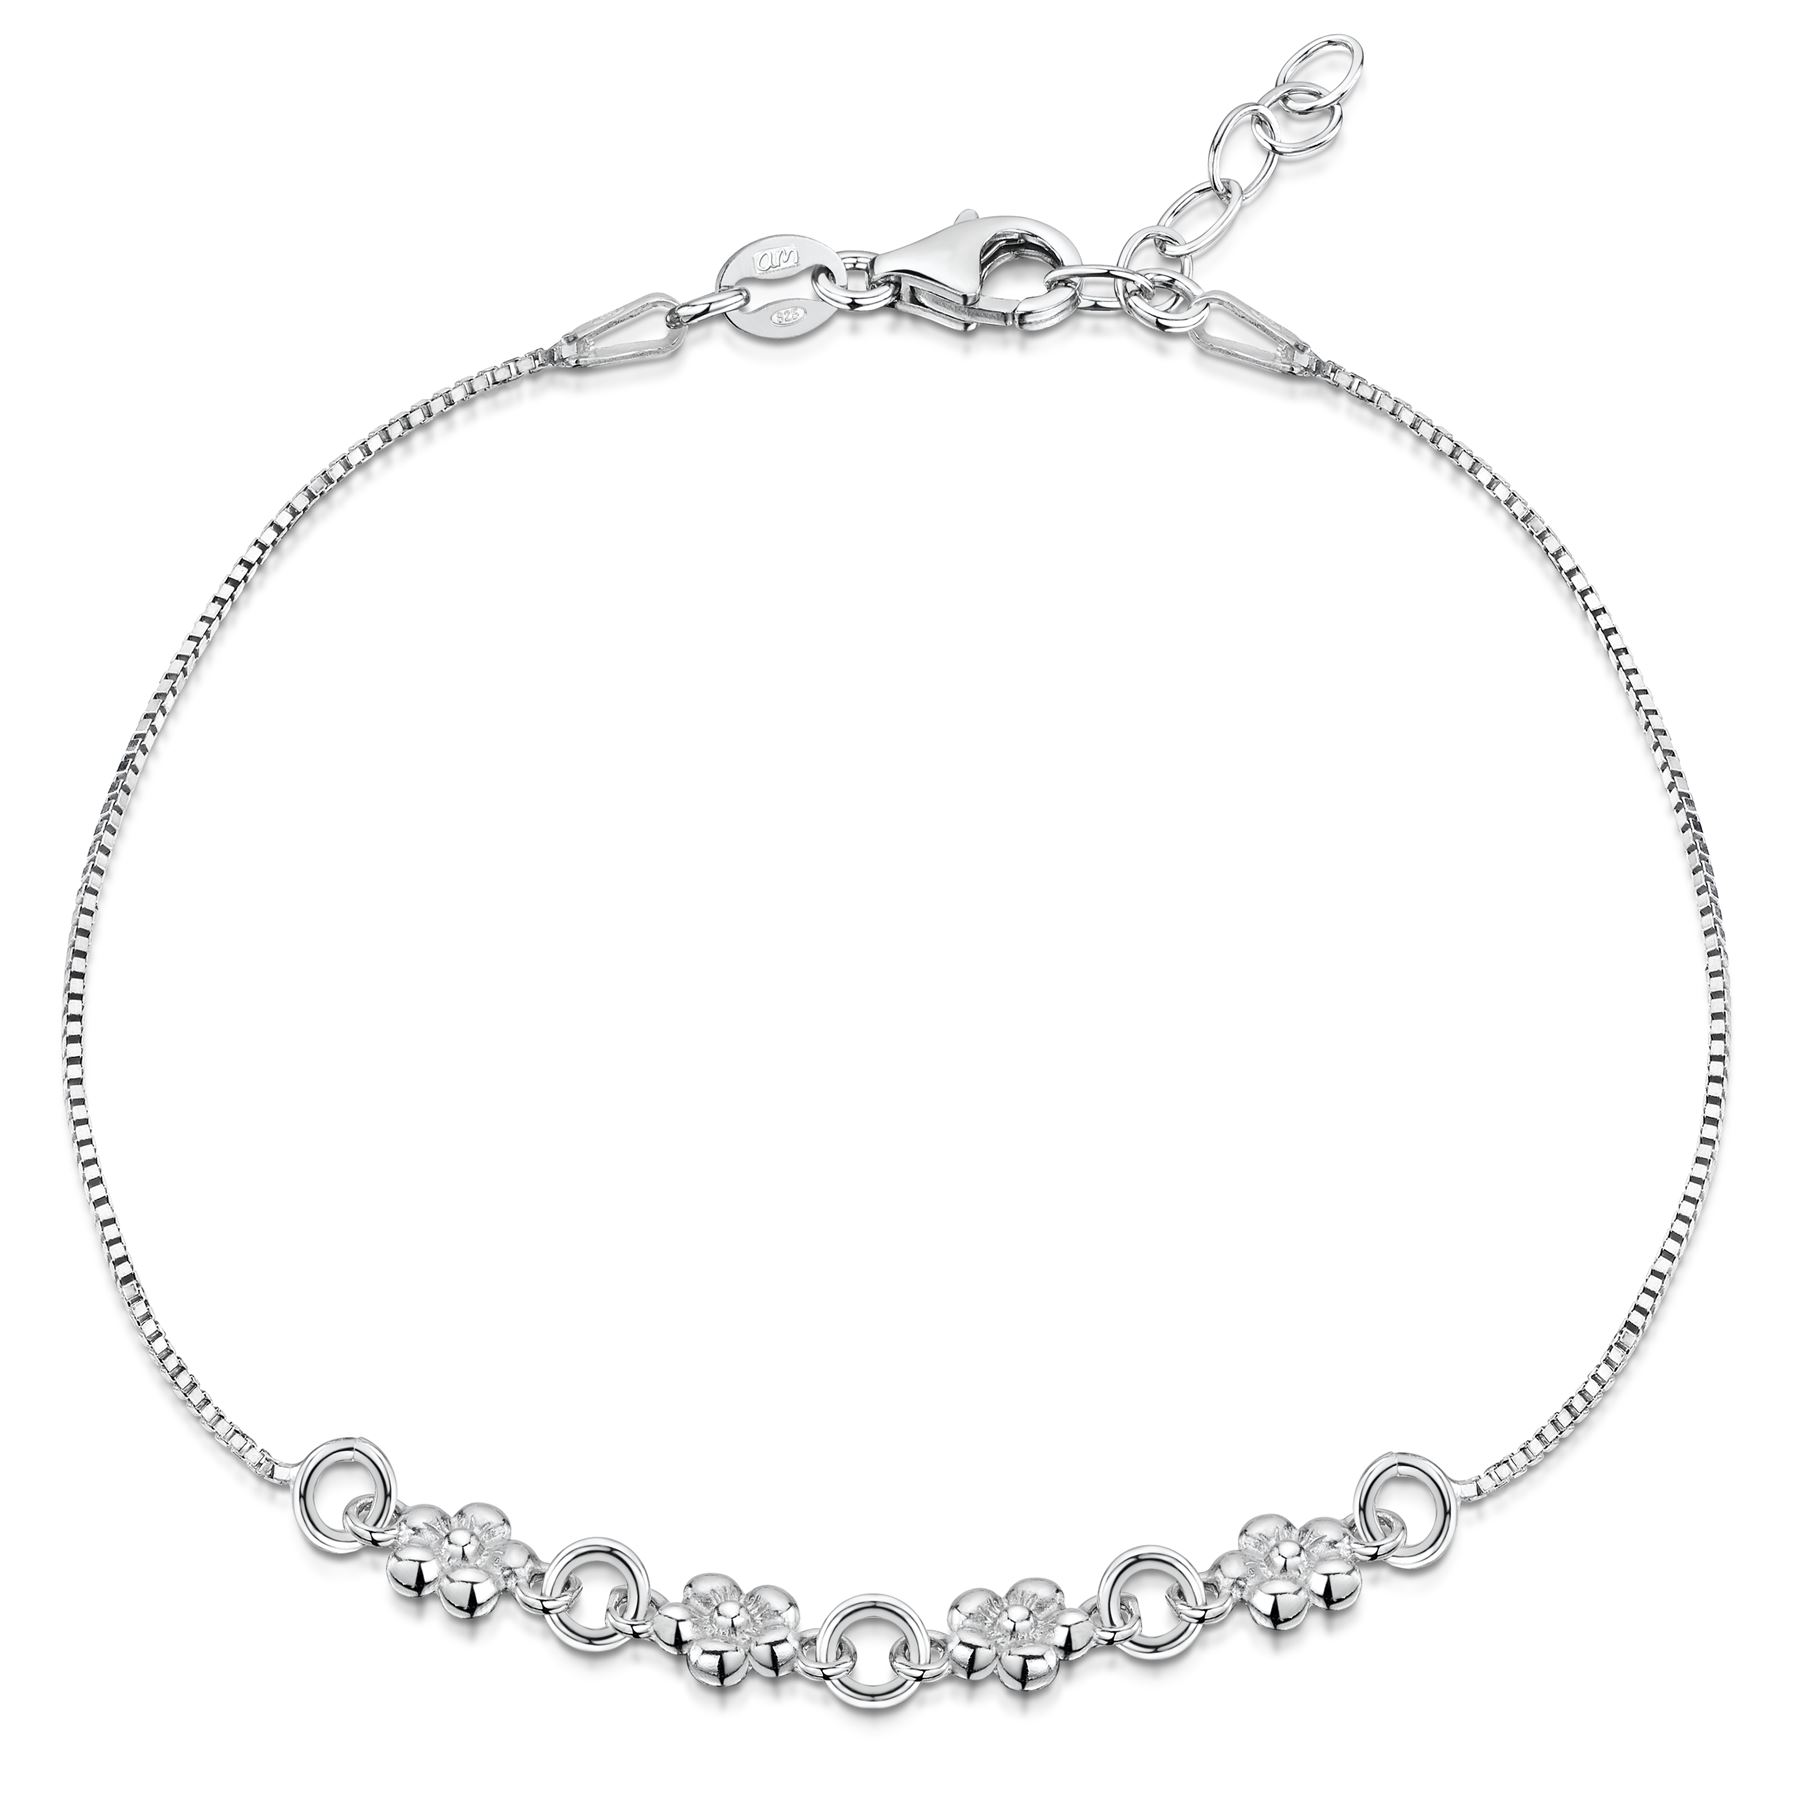 Amberta-Jewelry-925-Sterling-Silver-Adjustable-Bracelet-Italian-Bangle-for-Women thumbnail 11